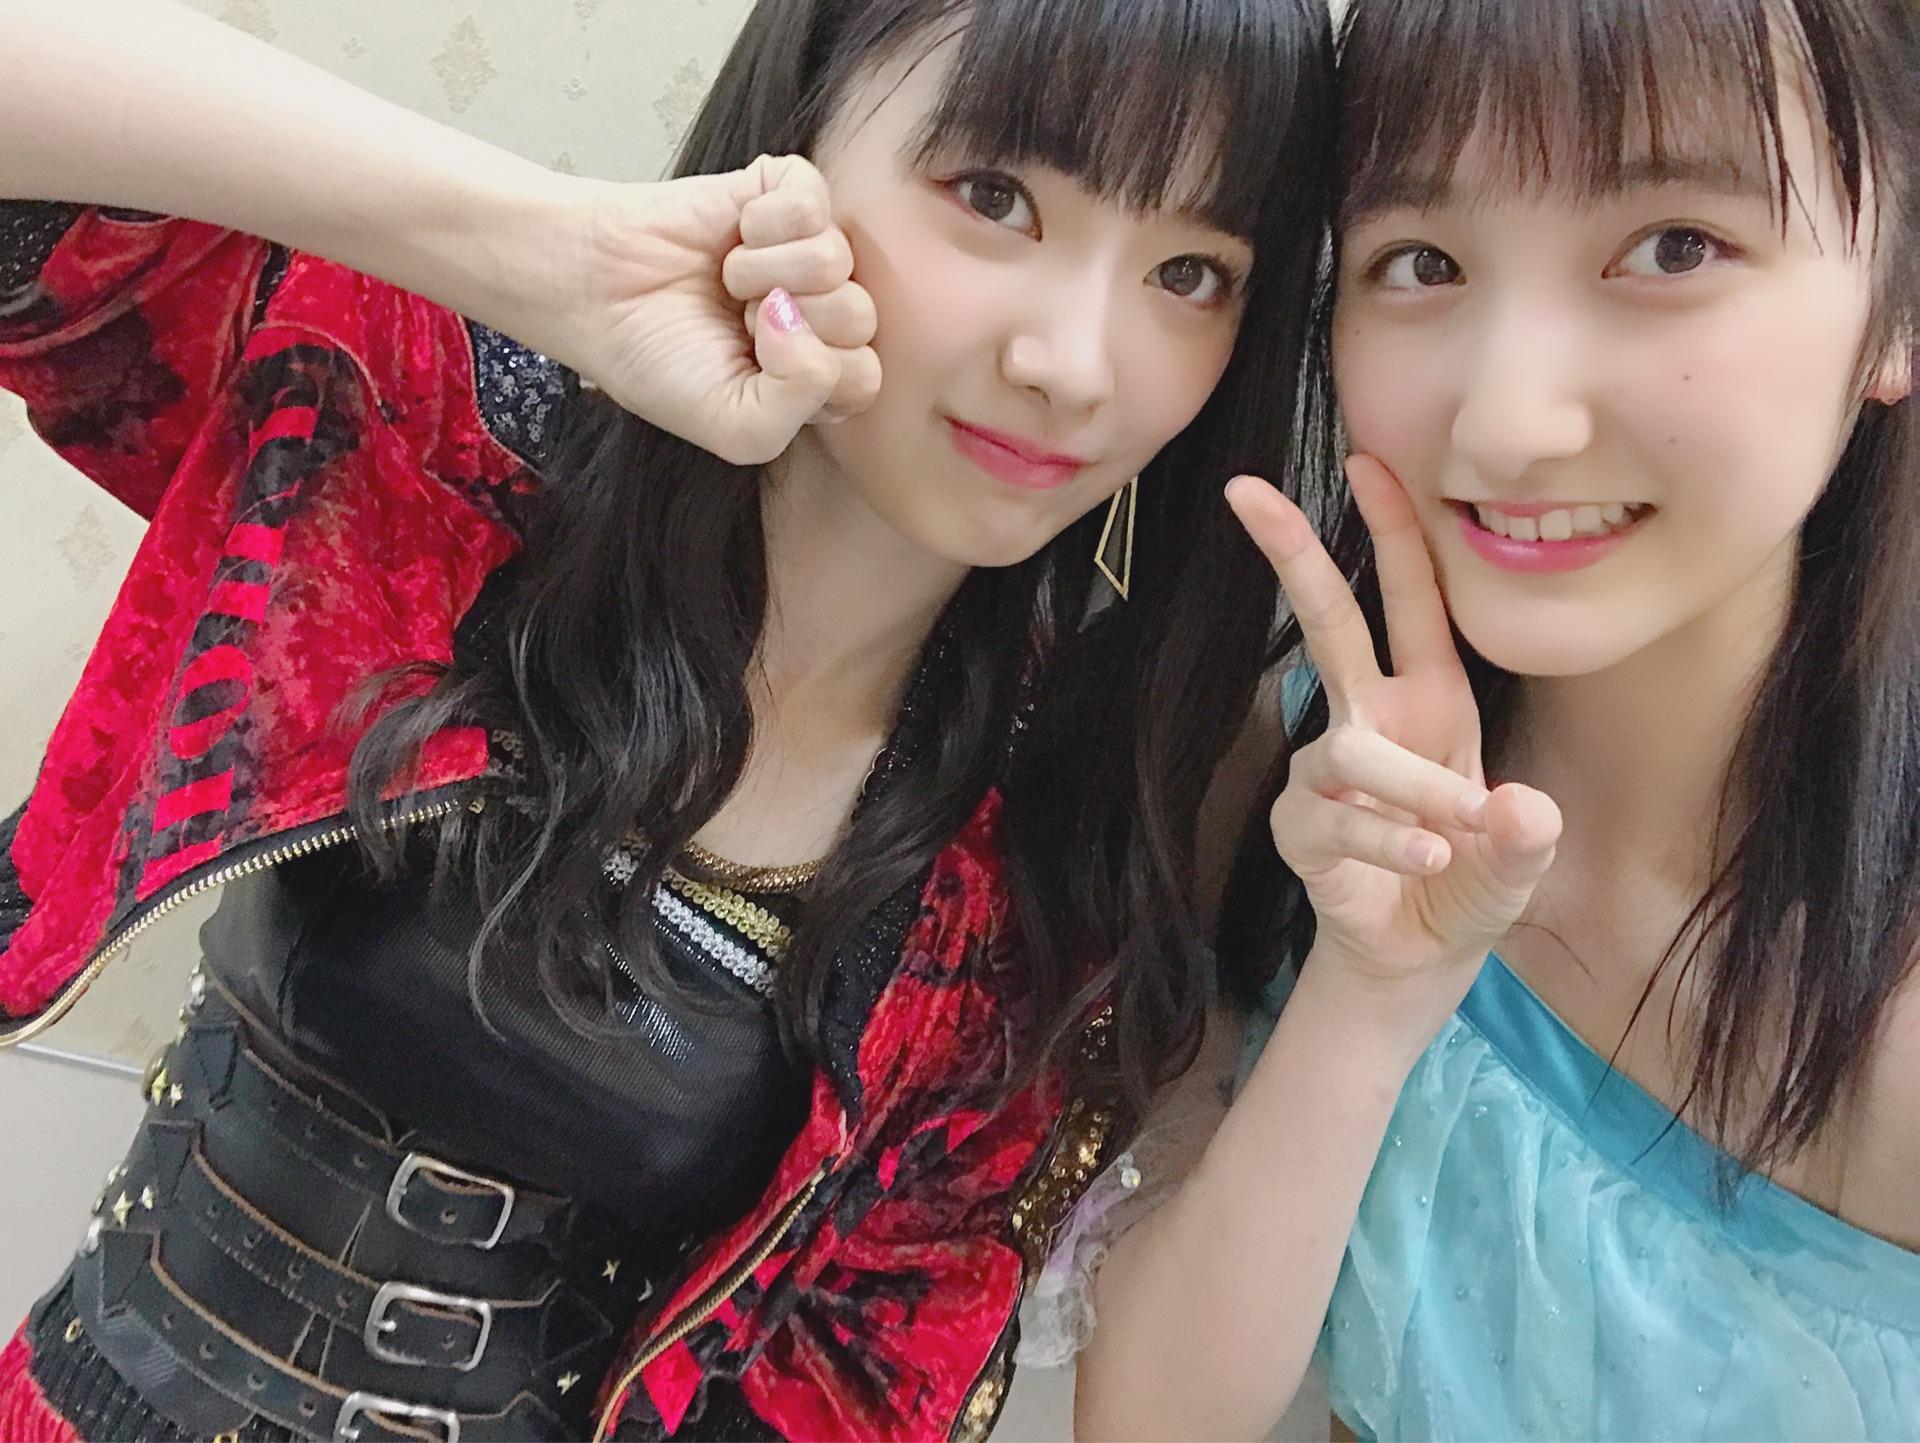 【AKB48】武藤十夢応援スレ☆95.2【十夢7位】 YouTube動画>27本 ->画像>54枚